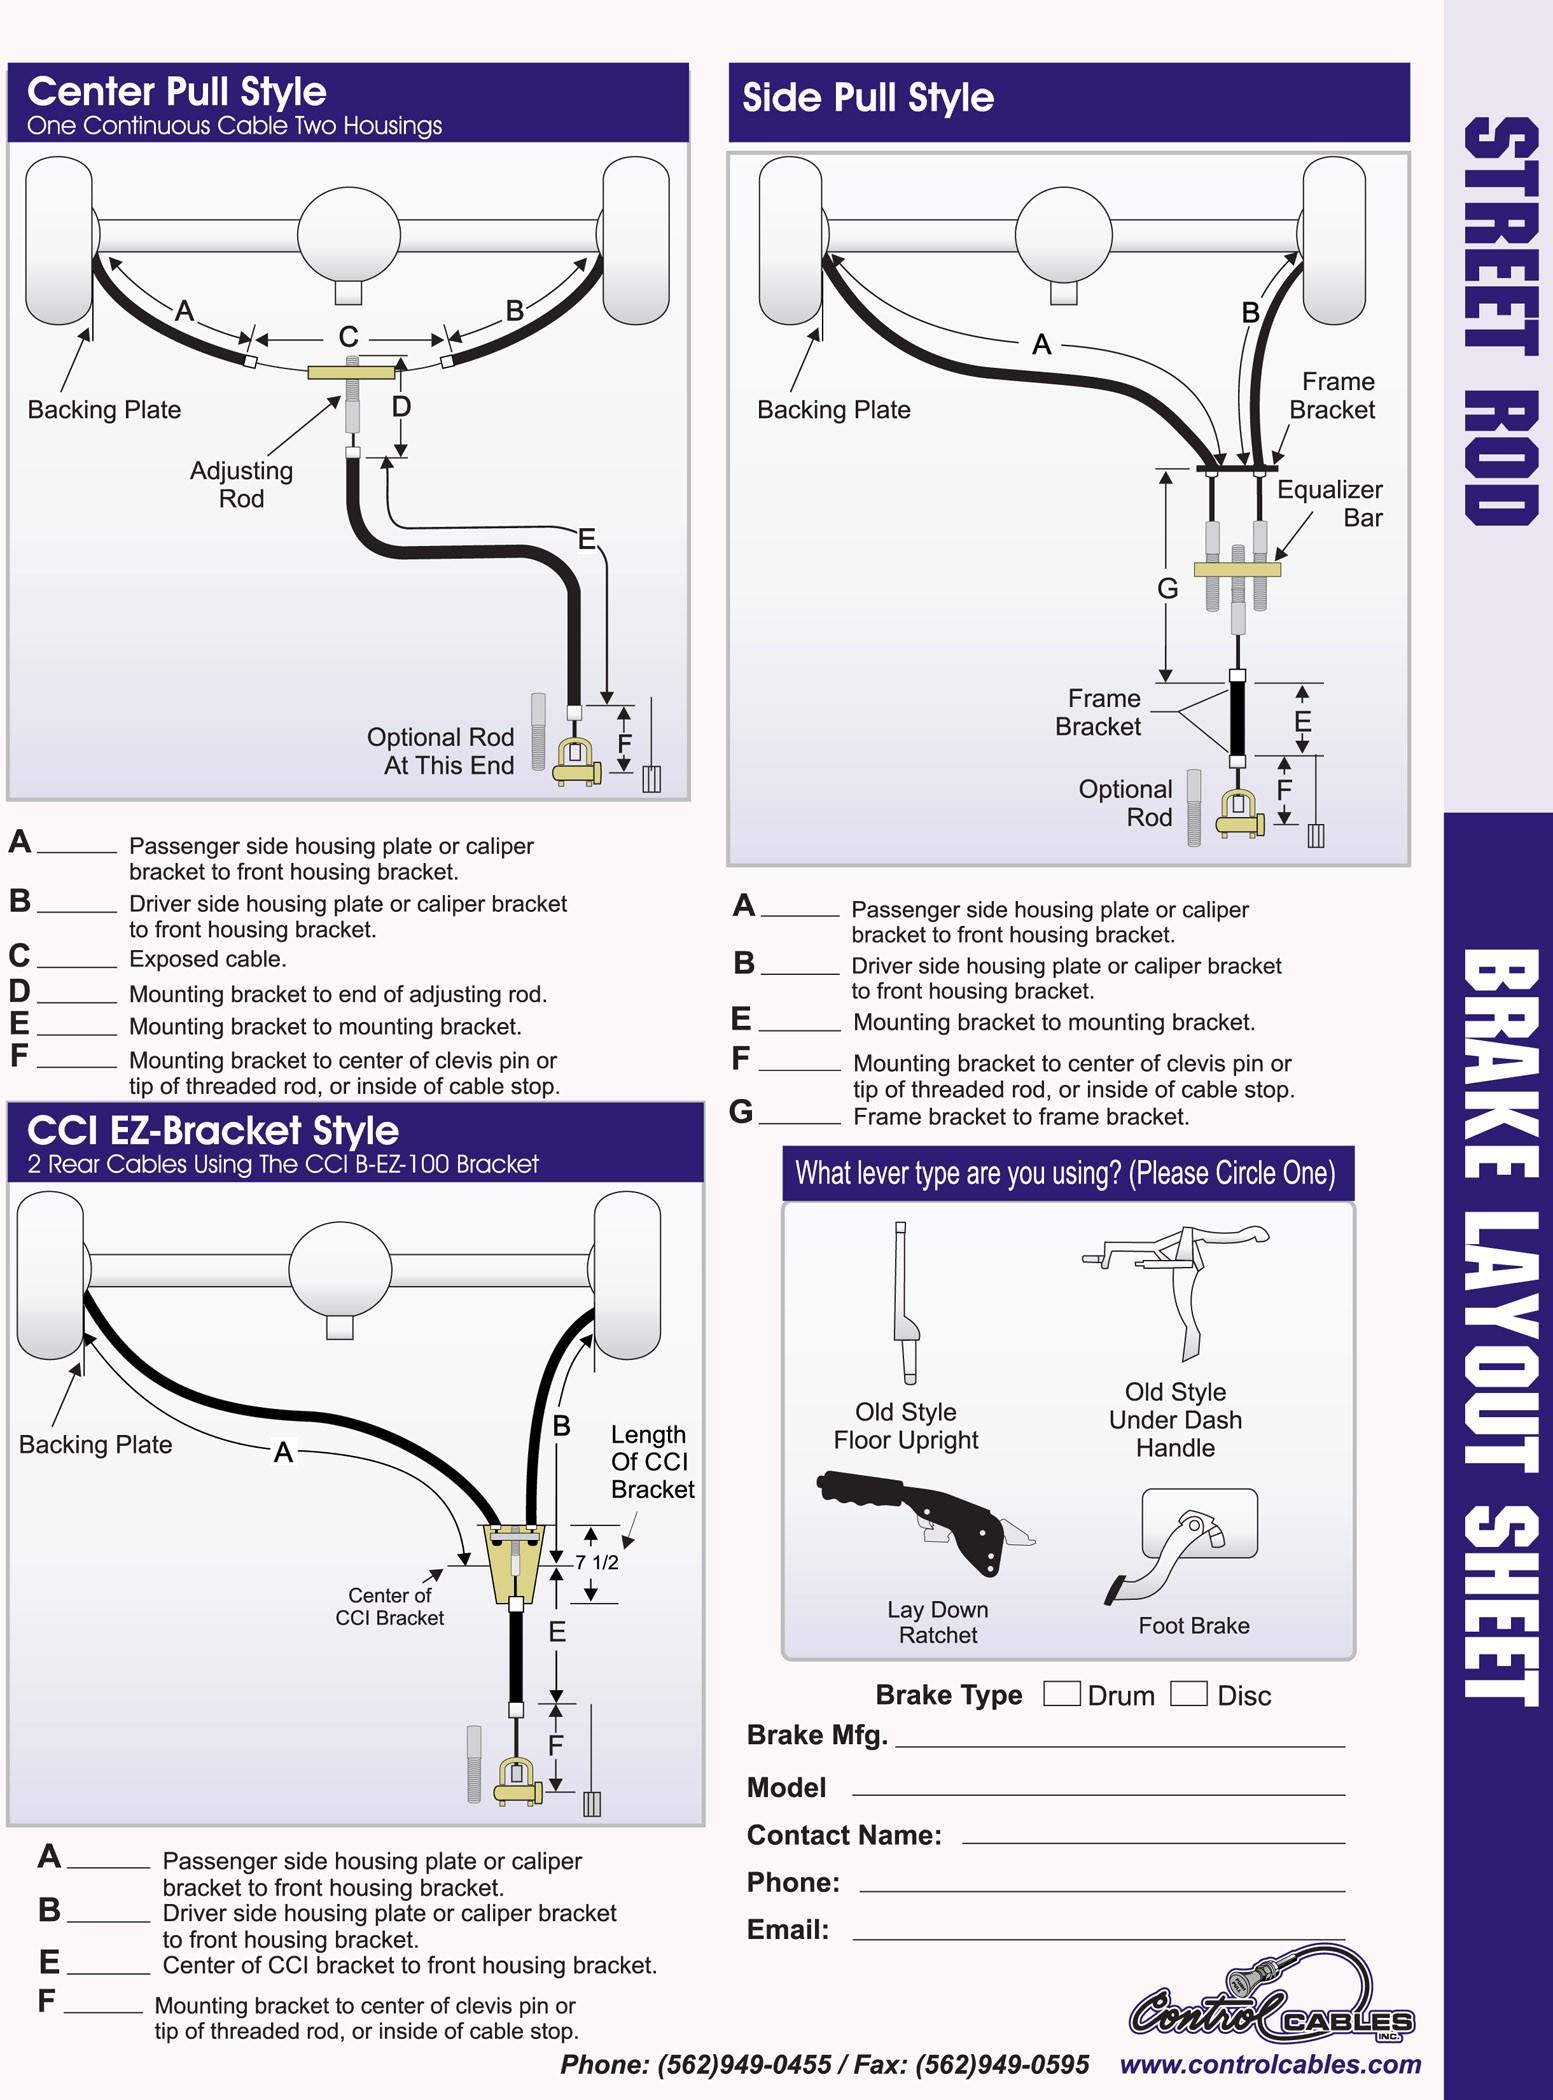 Disc Brake System Diagram Emergency Parking Brakes for Hot Rods – Racingjunk News Of Disc Brake System Diagram